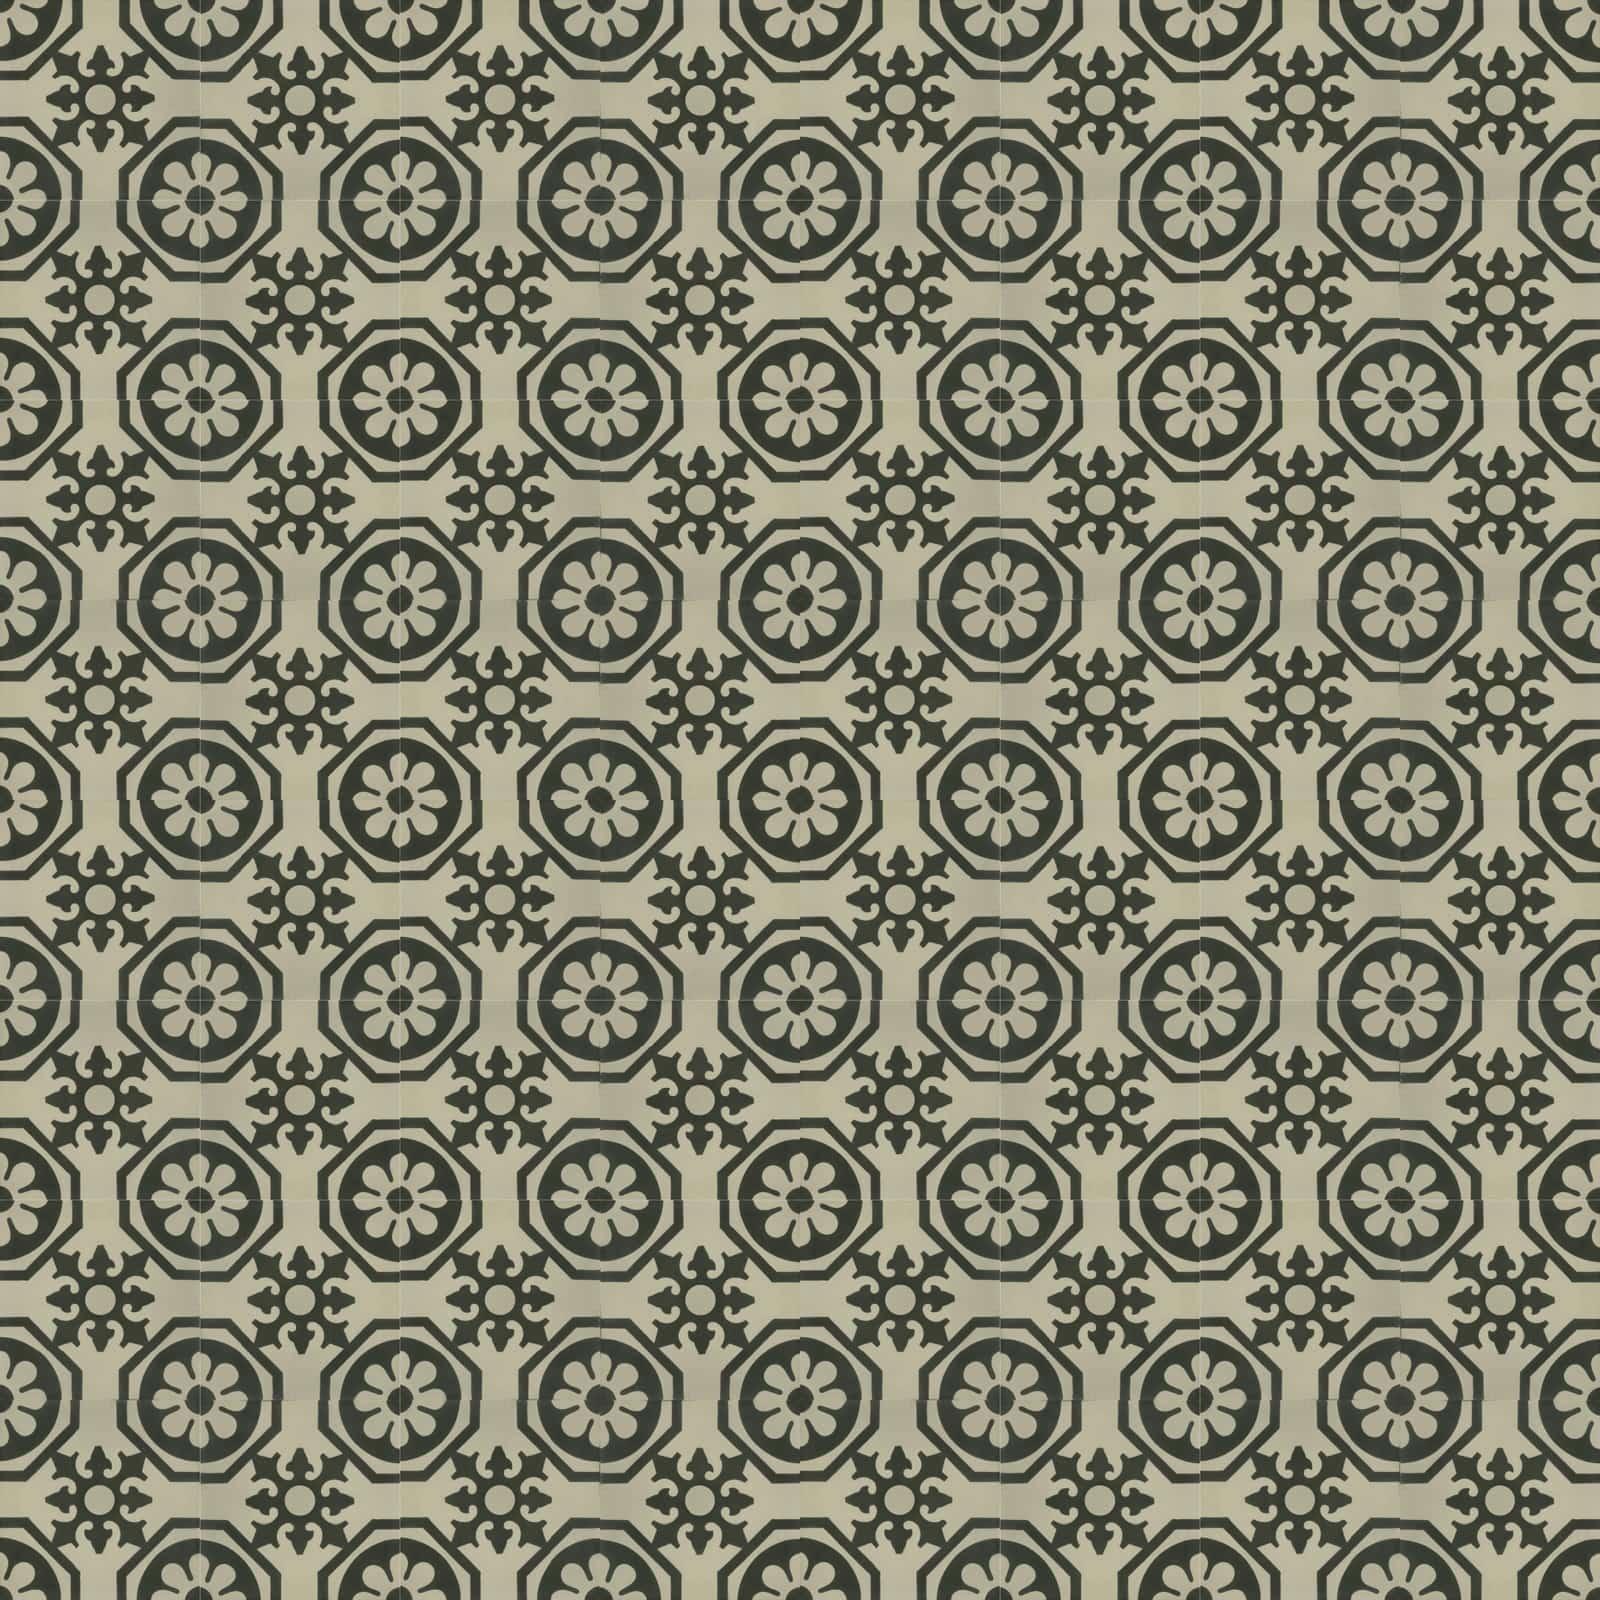 51102_verlegemuster-viaplatten | 51102